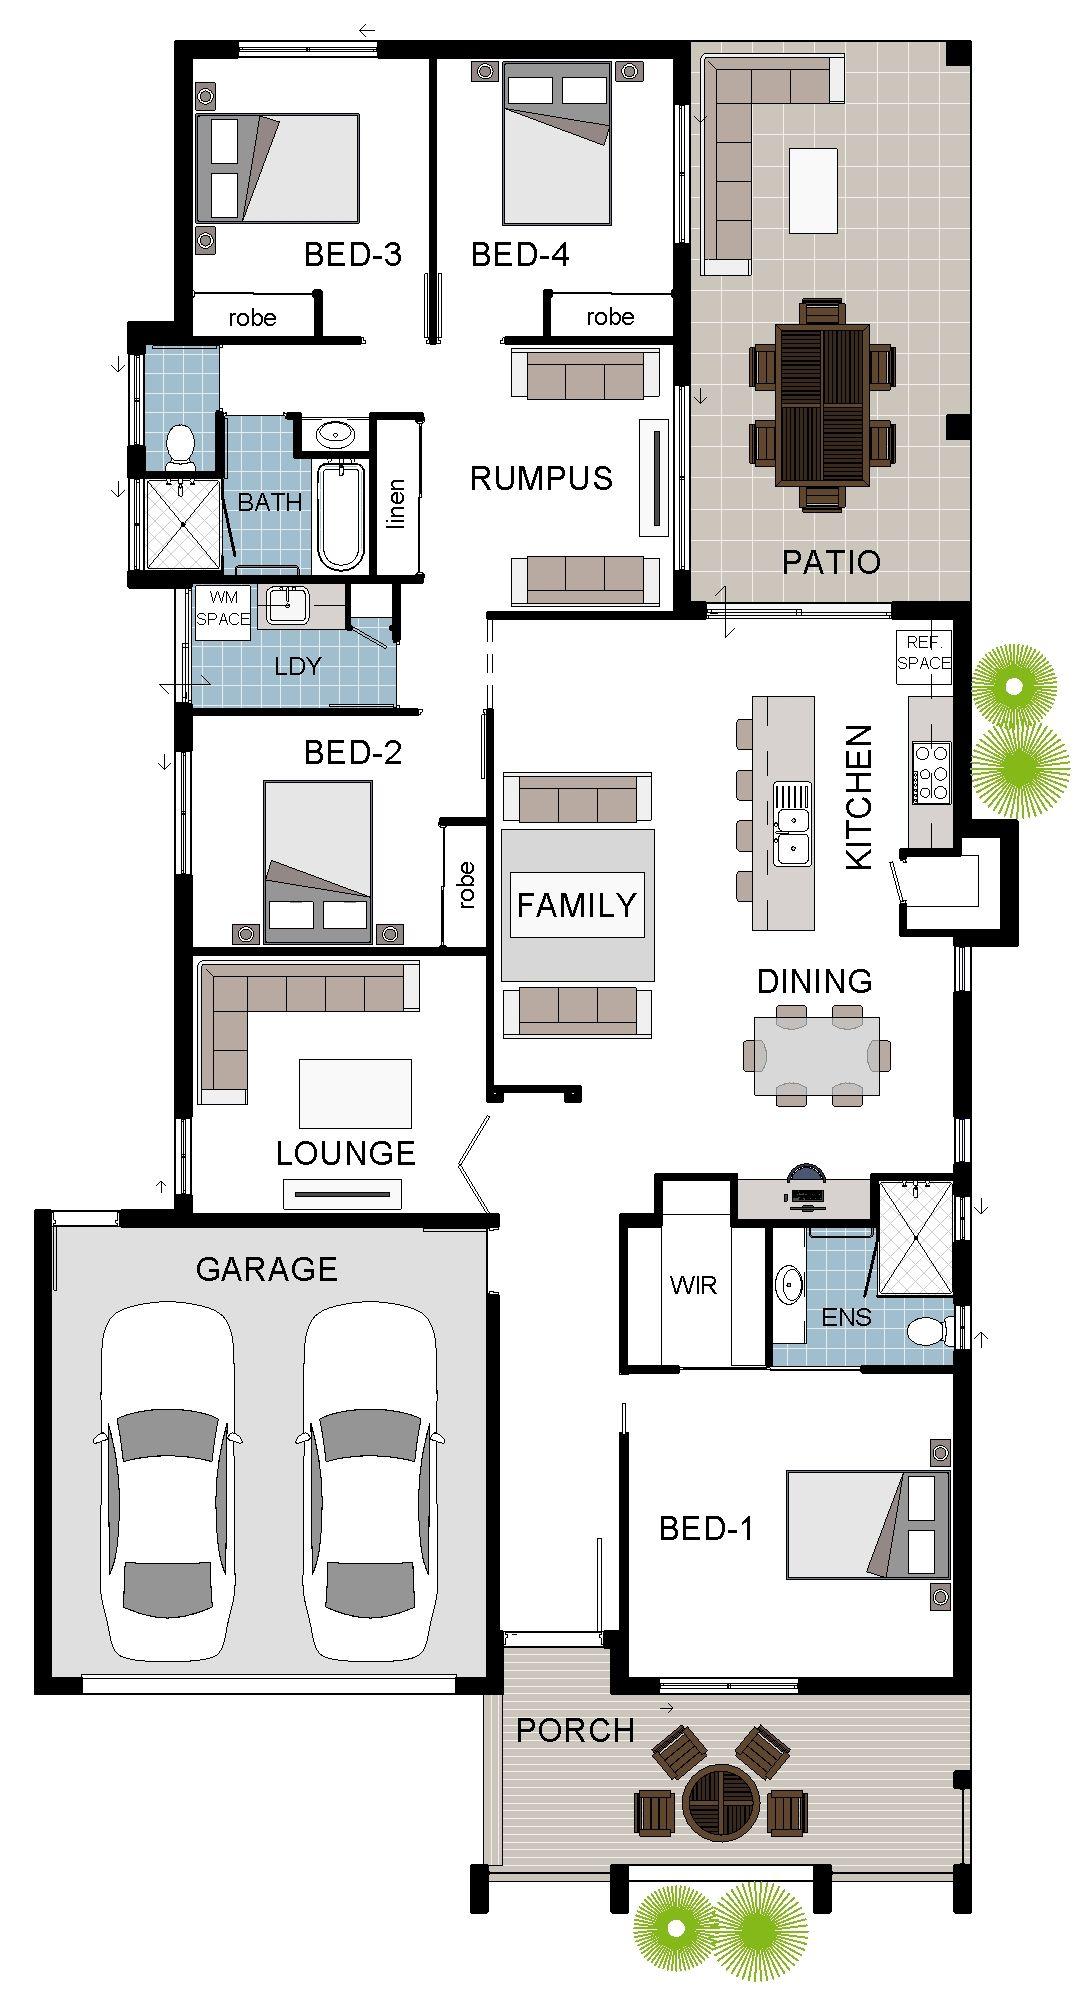 Floorplan design single storey display home design townsville queensland australia